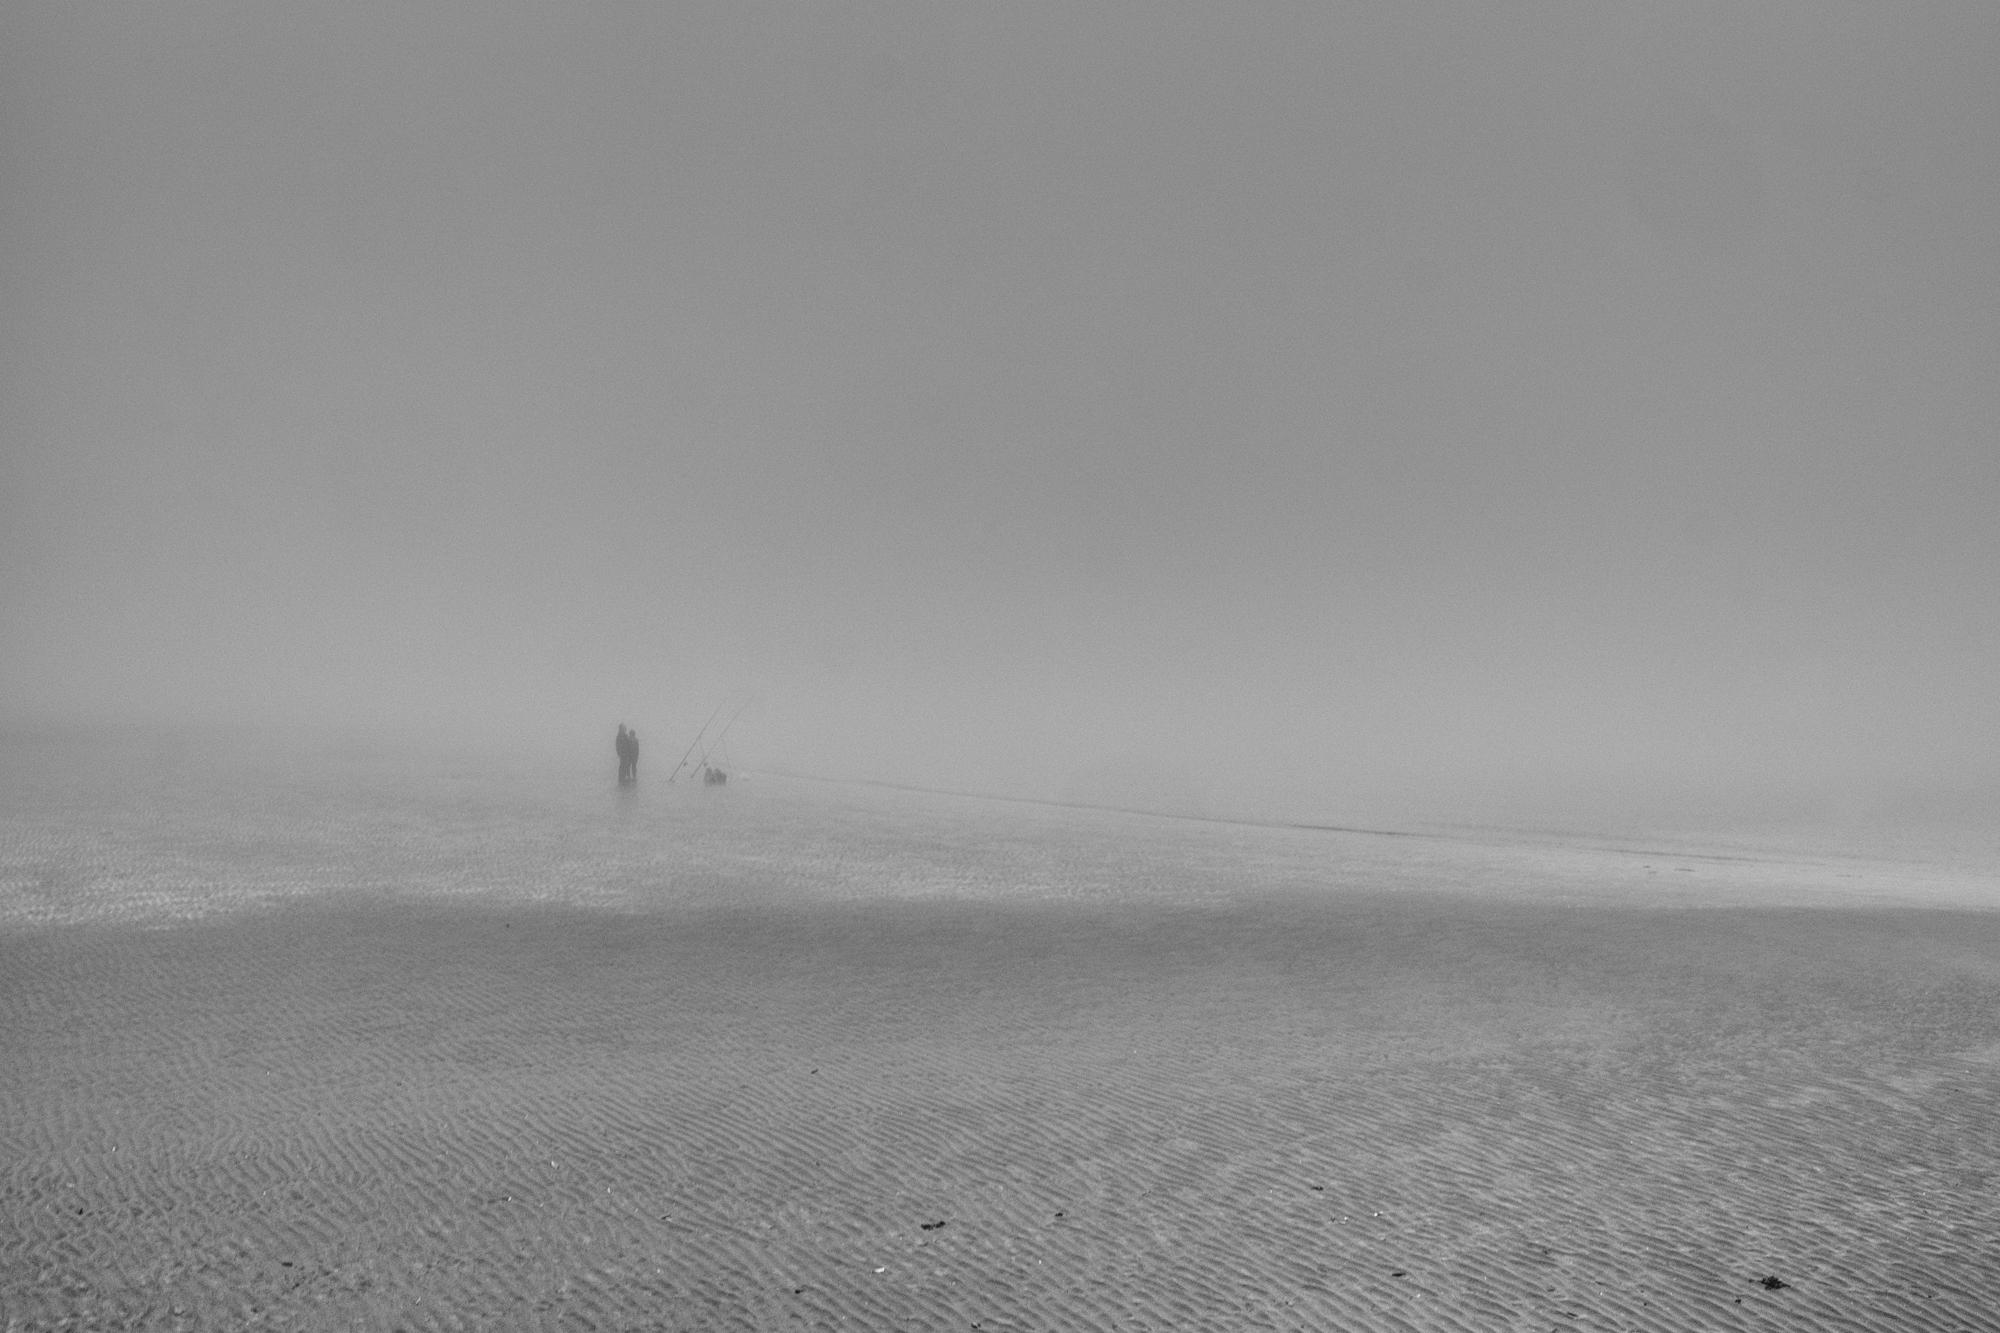 New Brighton - December 2016